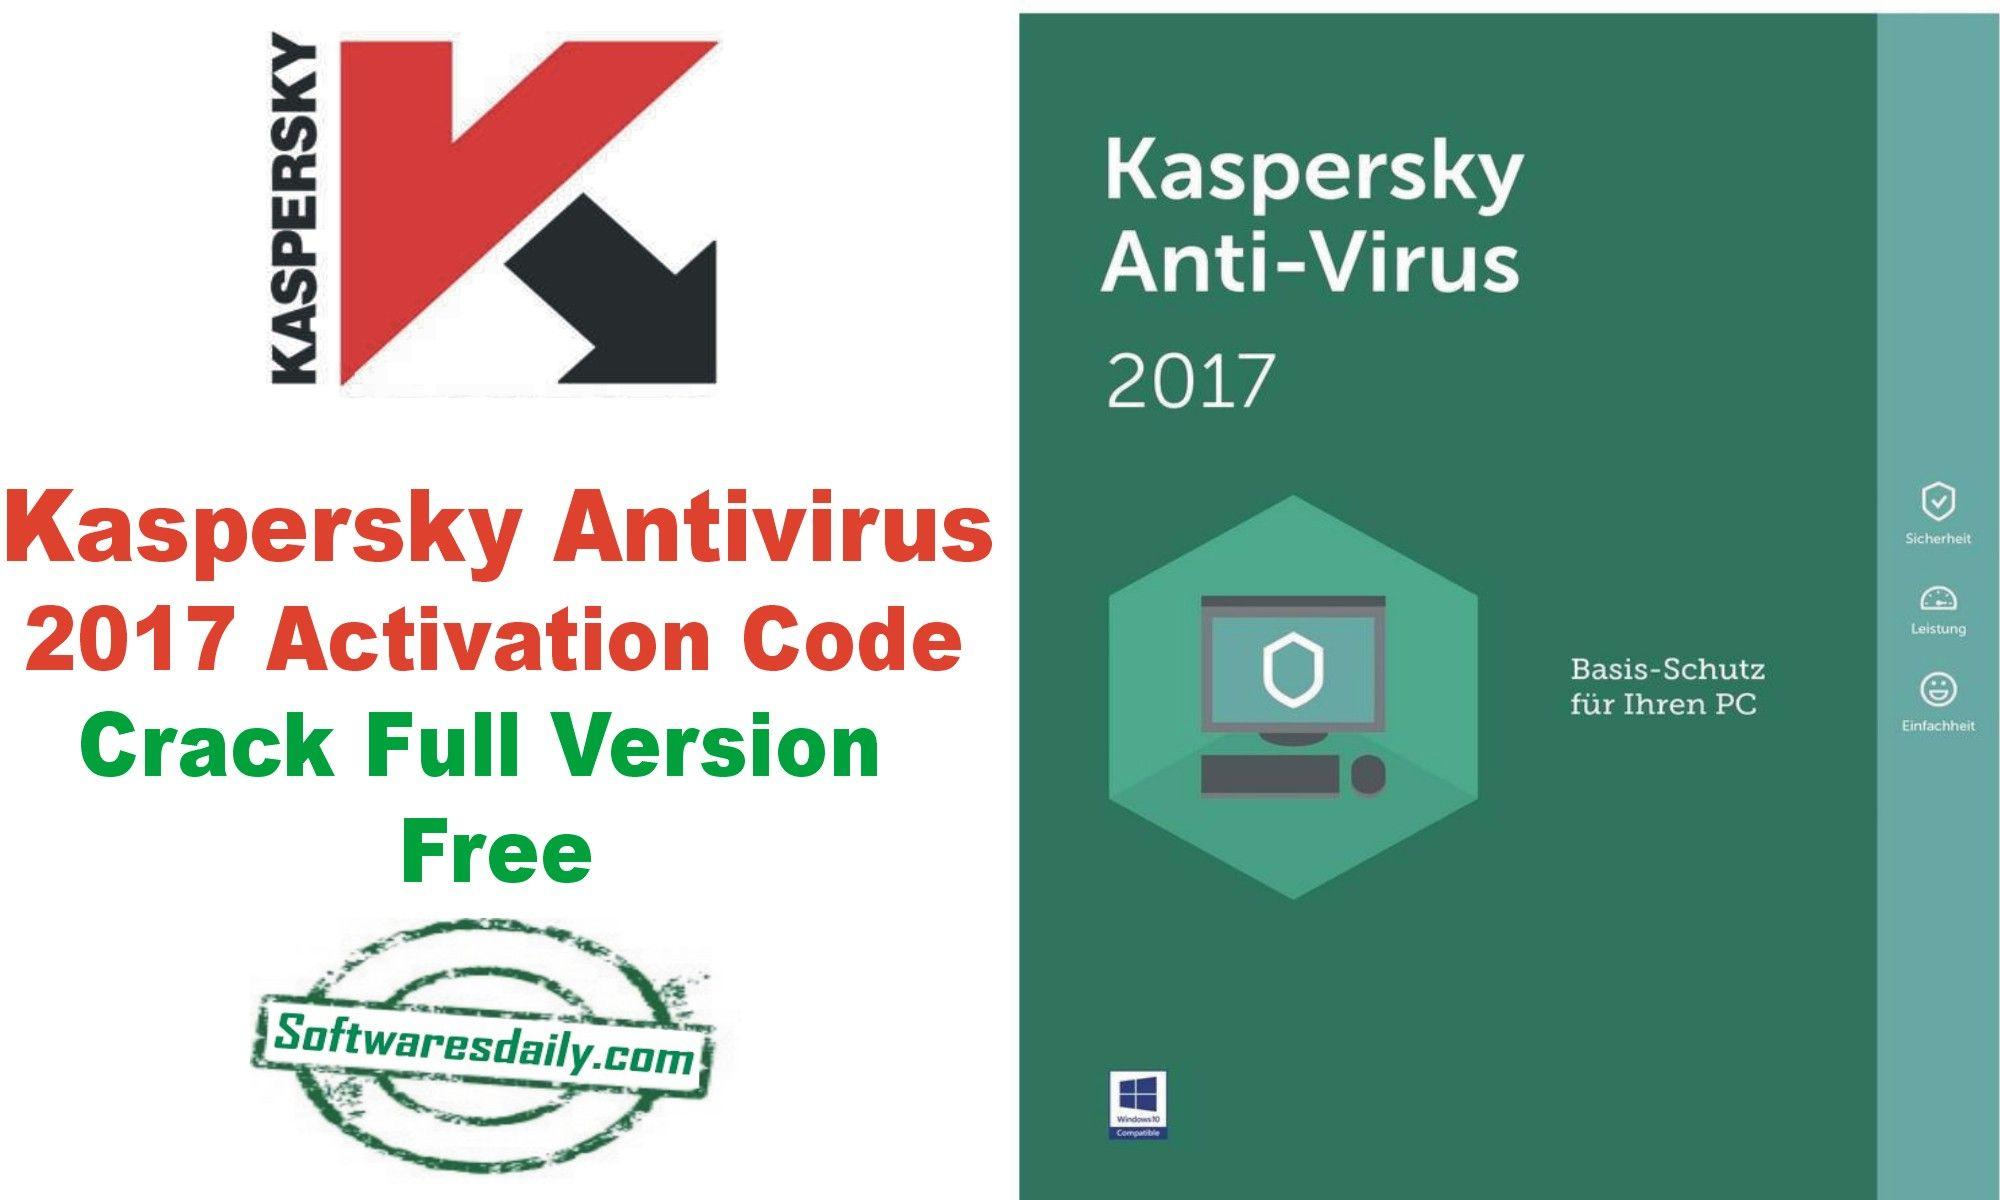 Vista automated activation crack v3.0 paradox